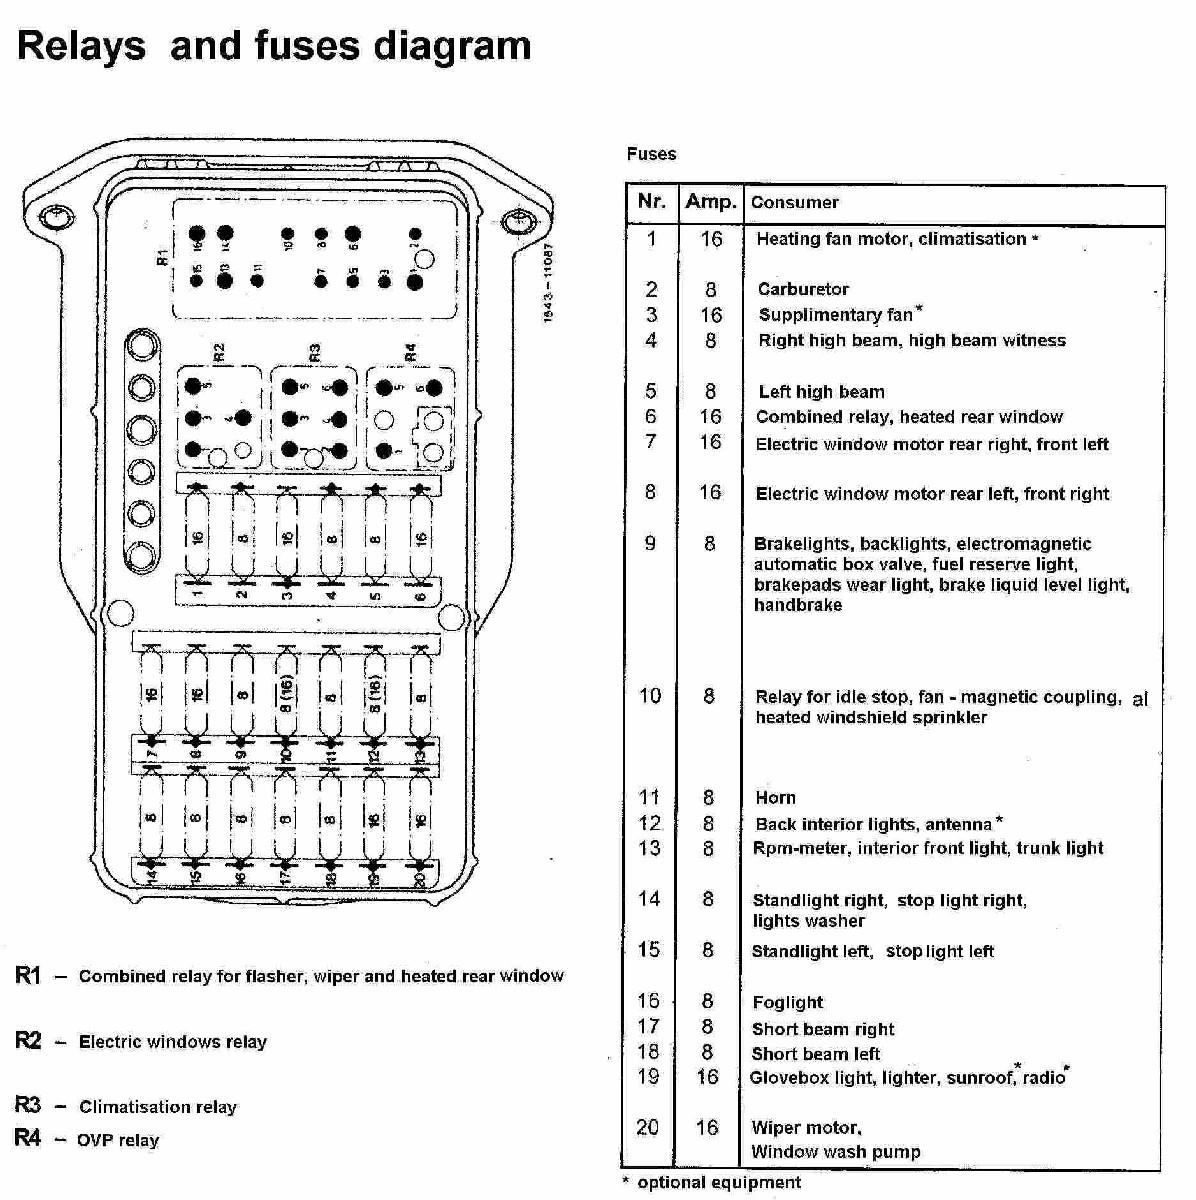 mercedes 190e fuse box - wiring diagram center hear-shine -  hear-shine.tatikids.it  tatikids.it